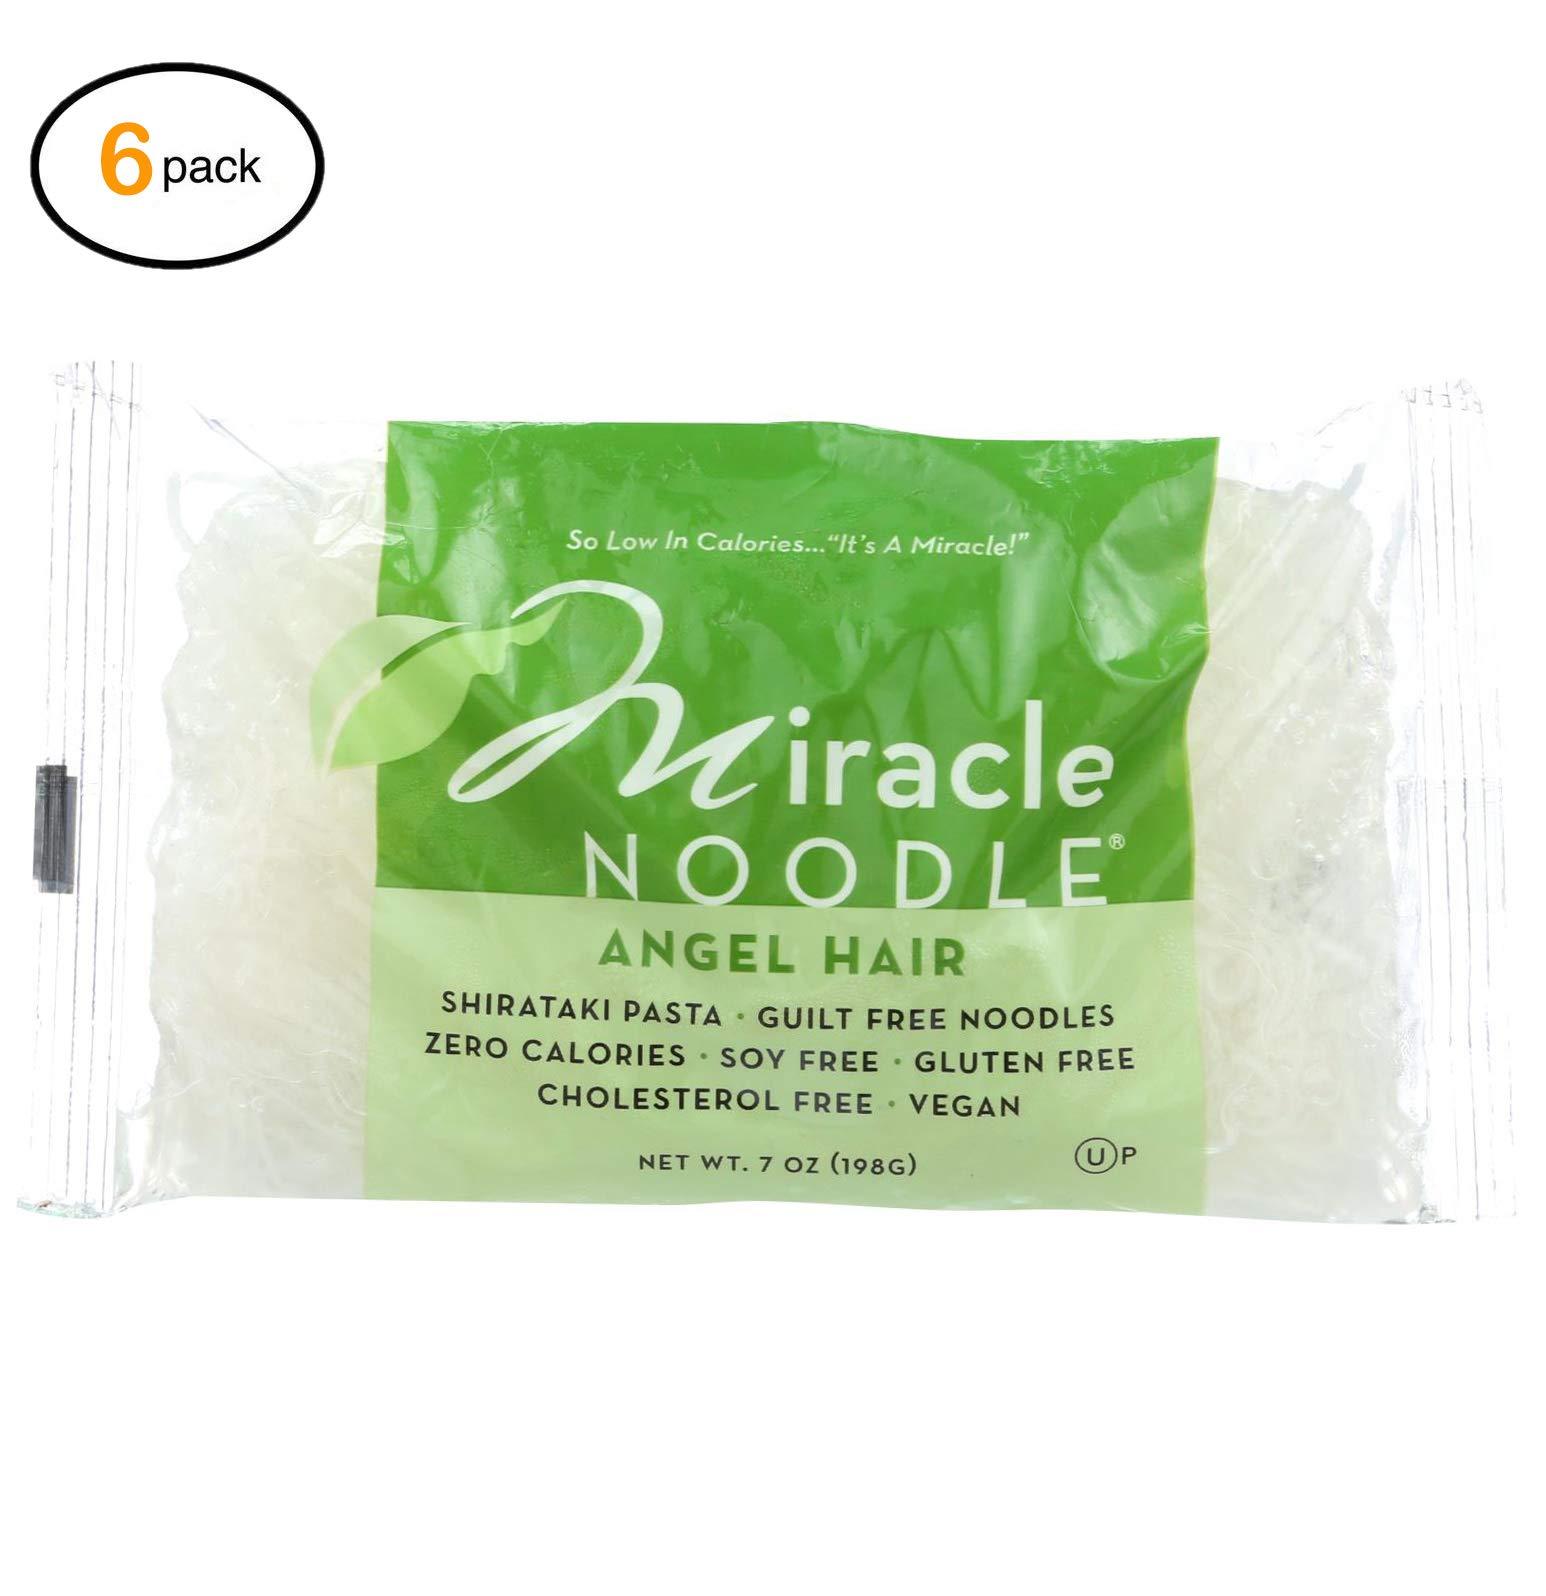 Miraclе Nооdlе Pasta - Shirataki - Miraclе Nооdlе - Angеl Hair - 7 оz - casе оf 6 - Bulk Buy by Miraclе Nооdlе